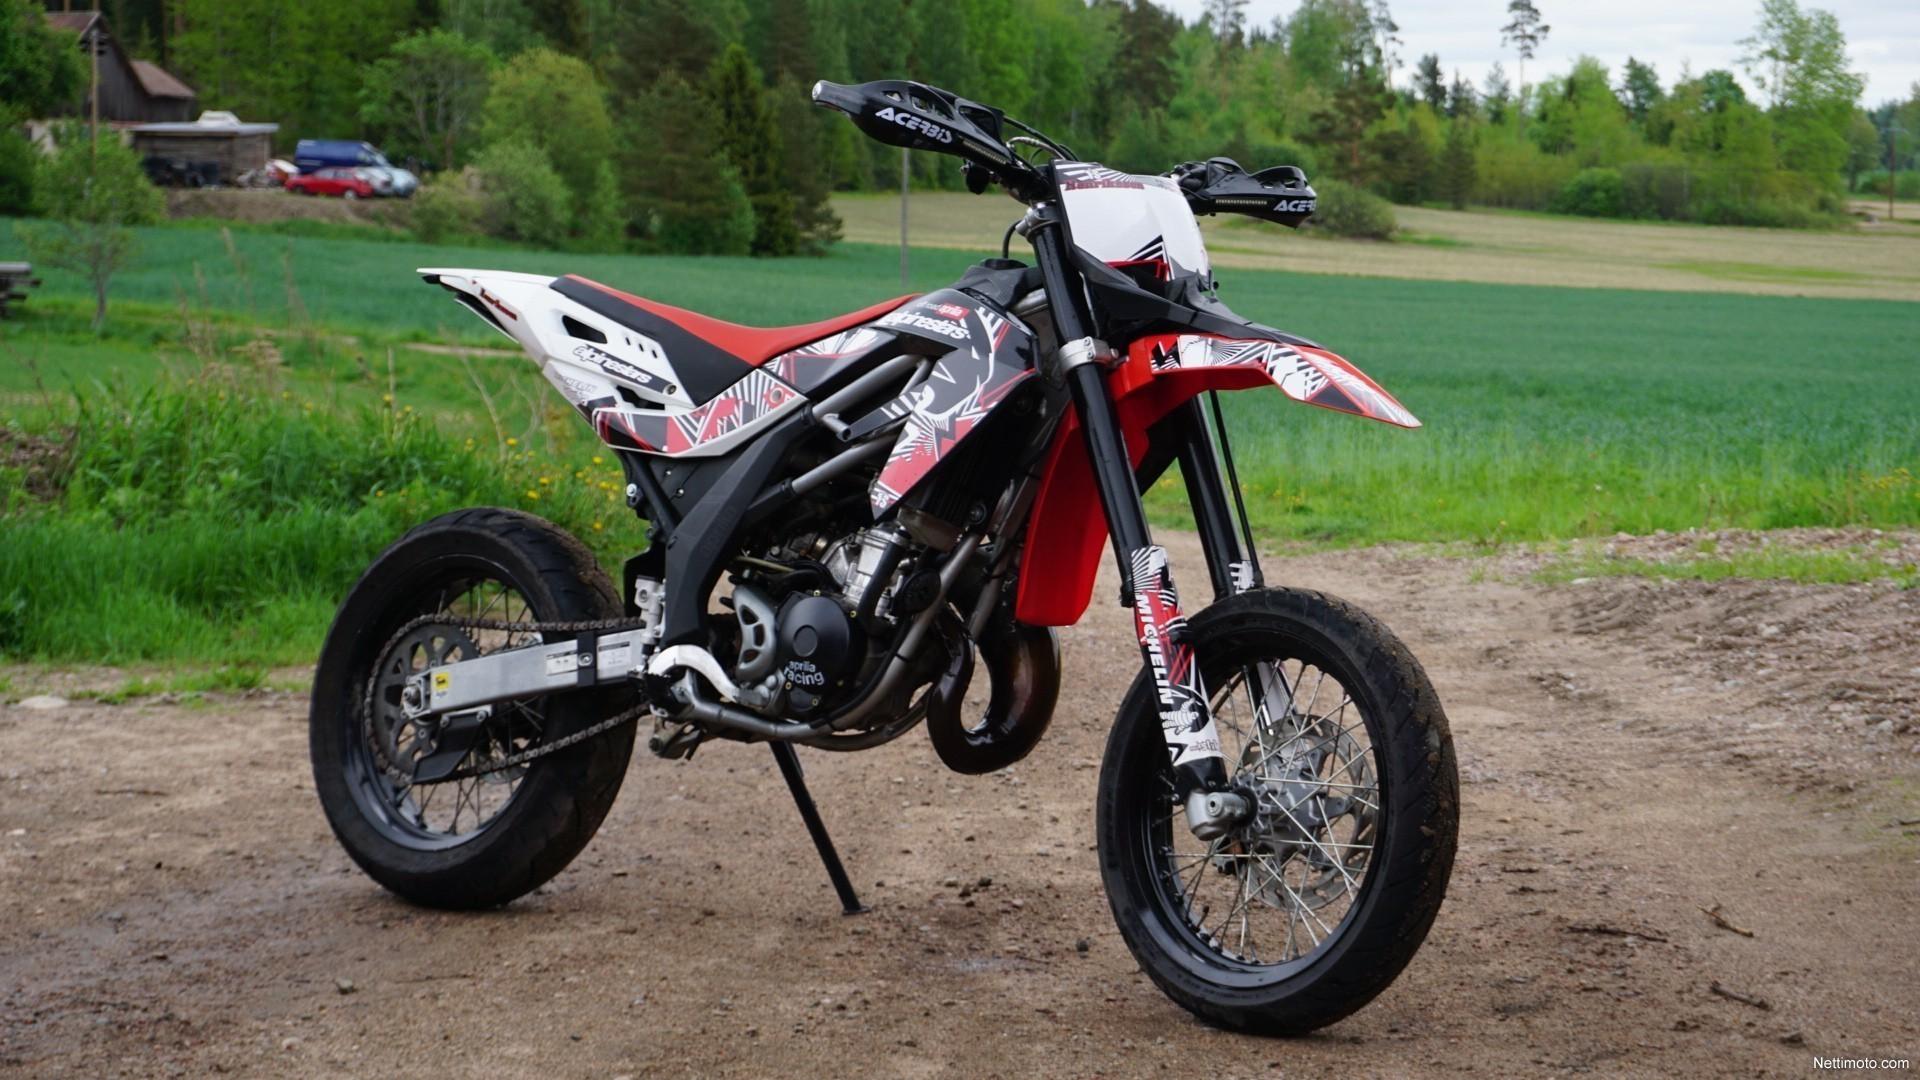 Aprilia SX 125 125 cm³ 2010 - Sastamala - Moottoripyörä